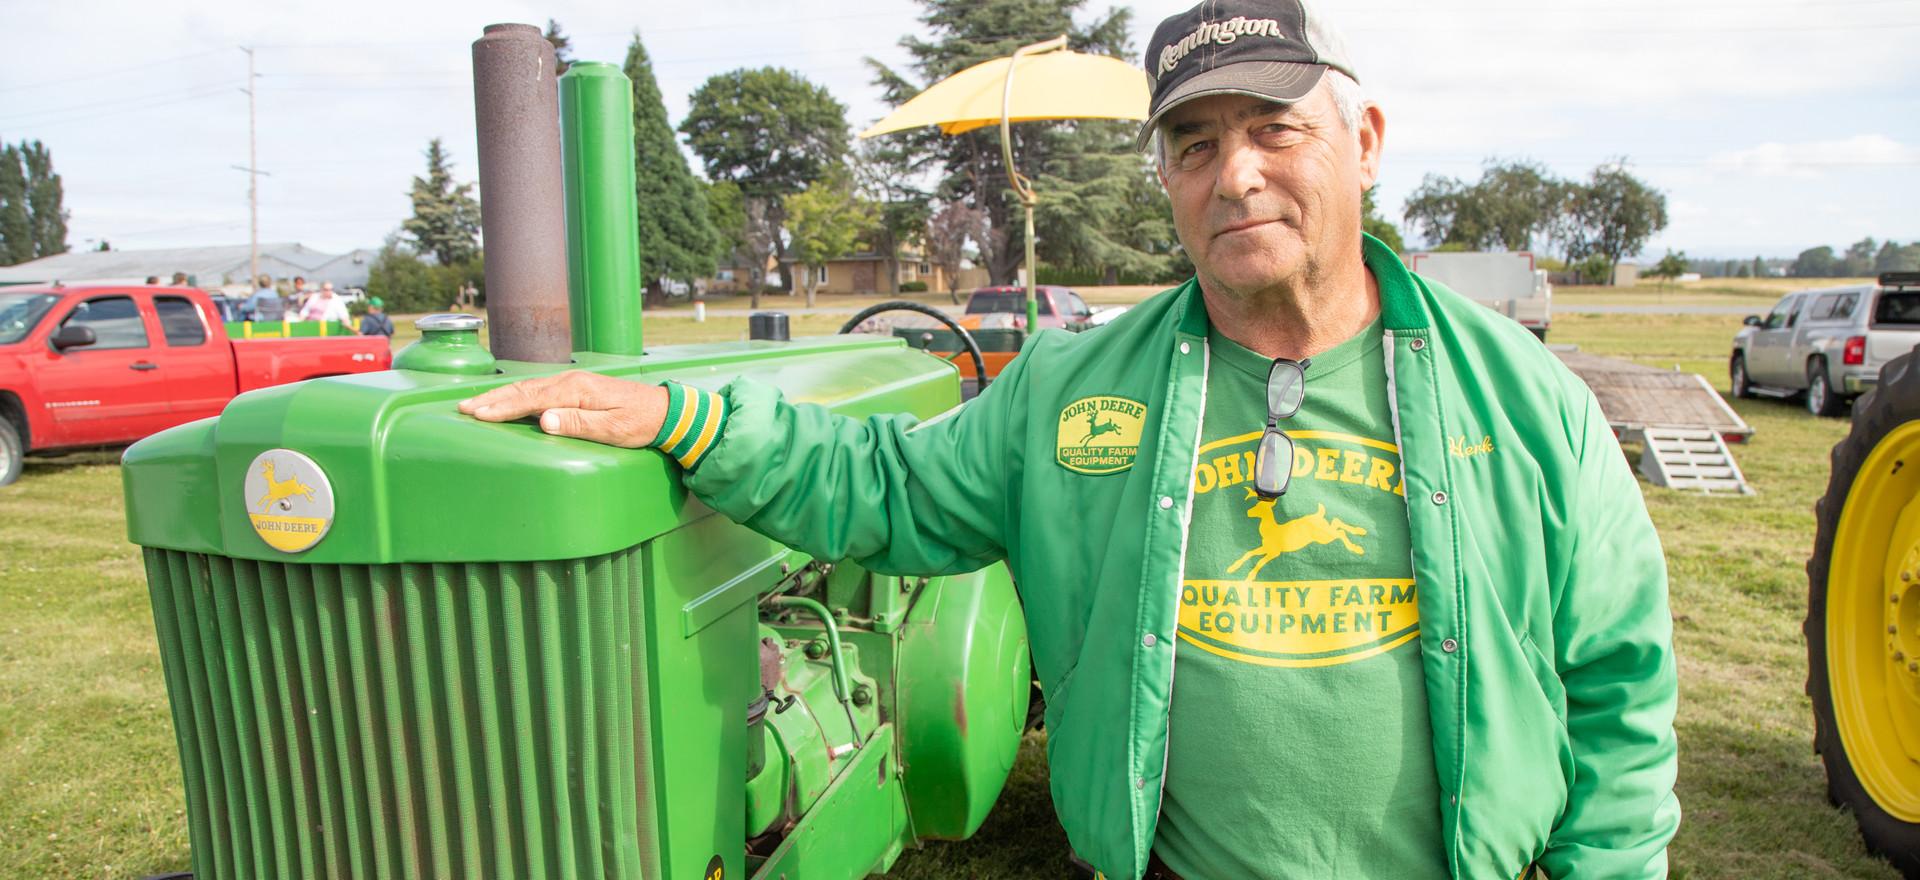 svh-20180723-news-tractor-1.jpg